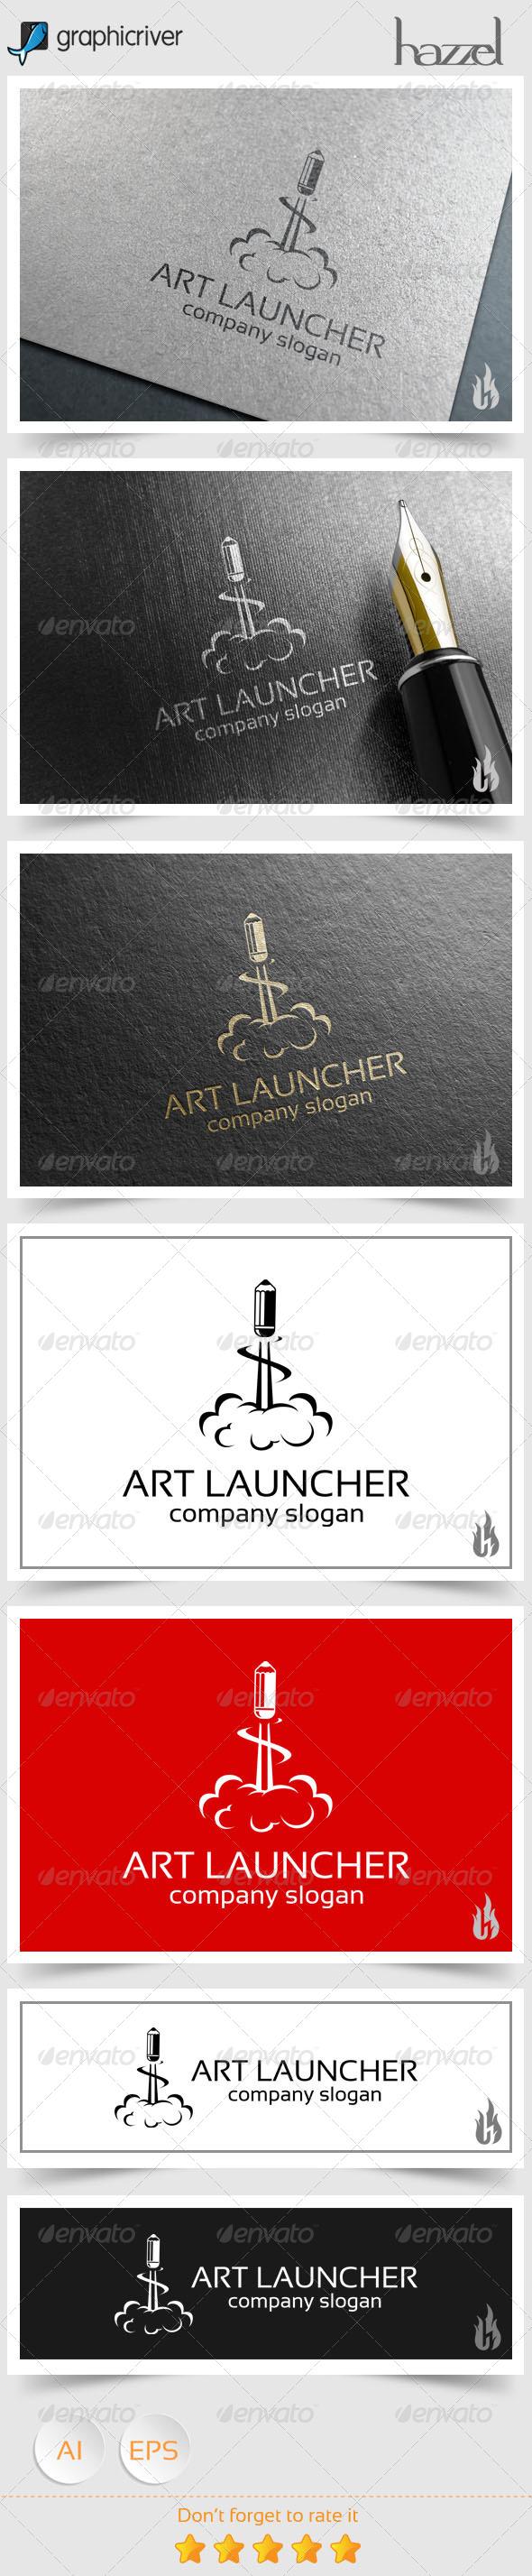 GraphicRiver Art Launcher Logo 8639661